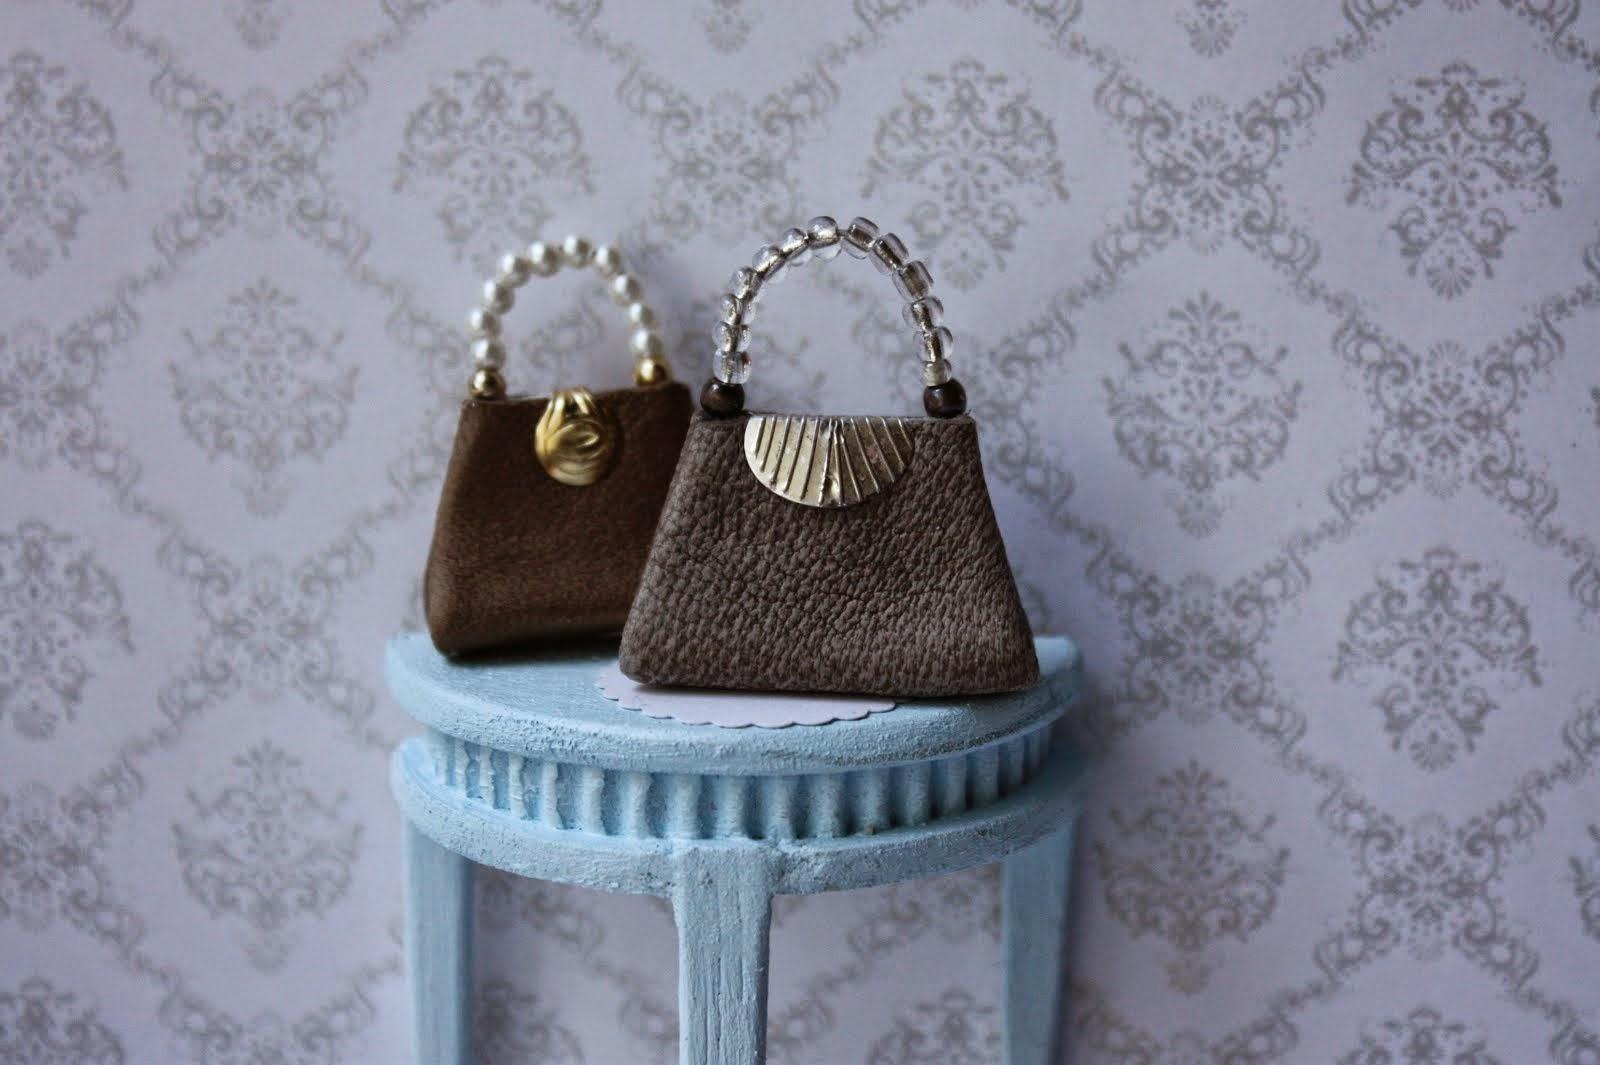 My Dolls House Miniature Blog: